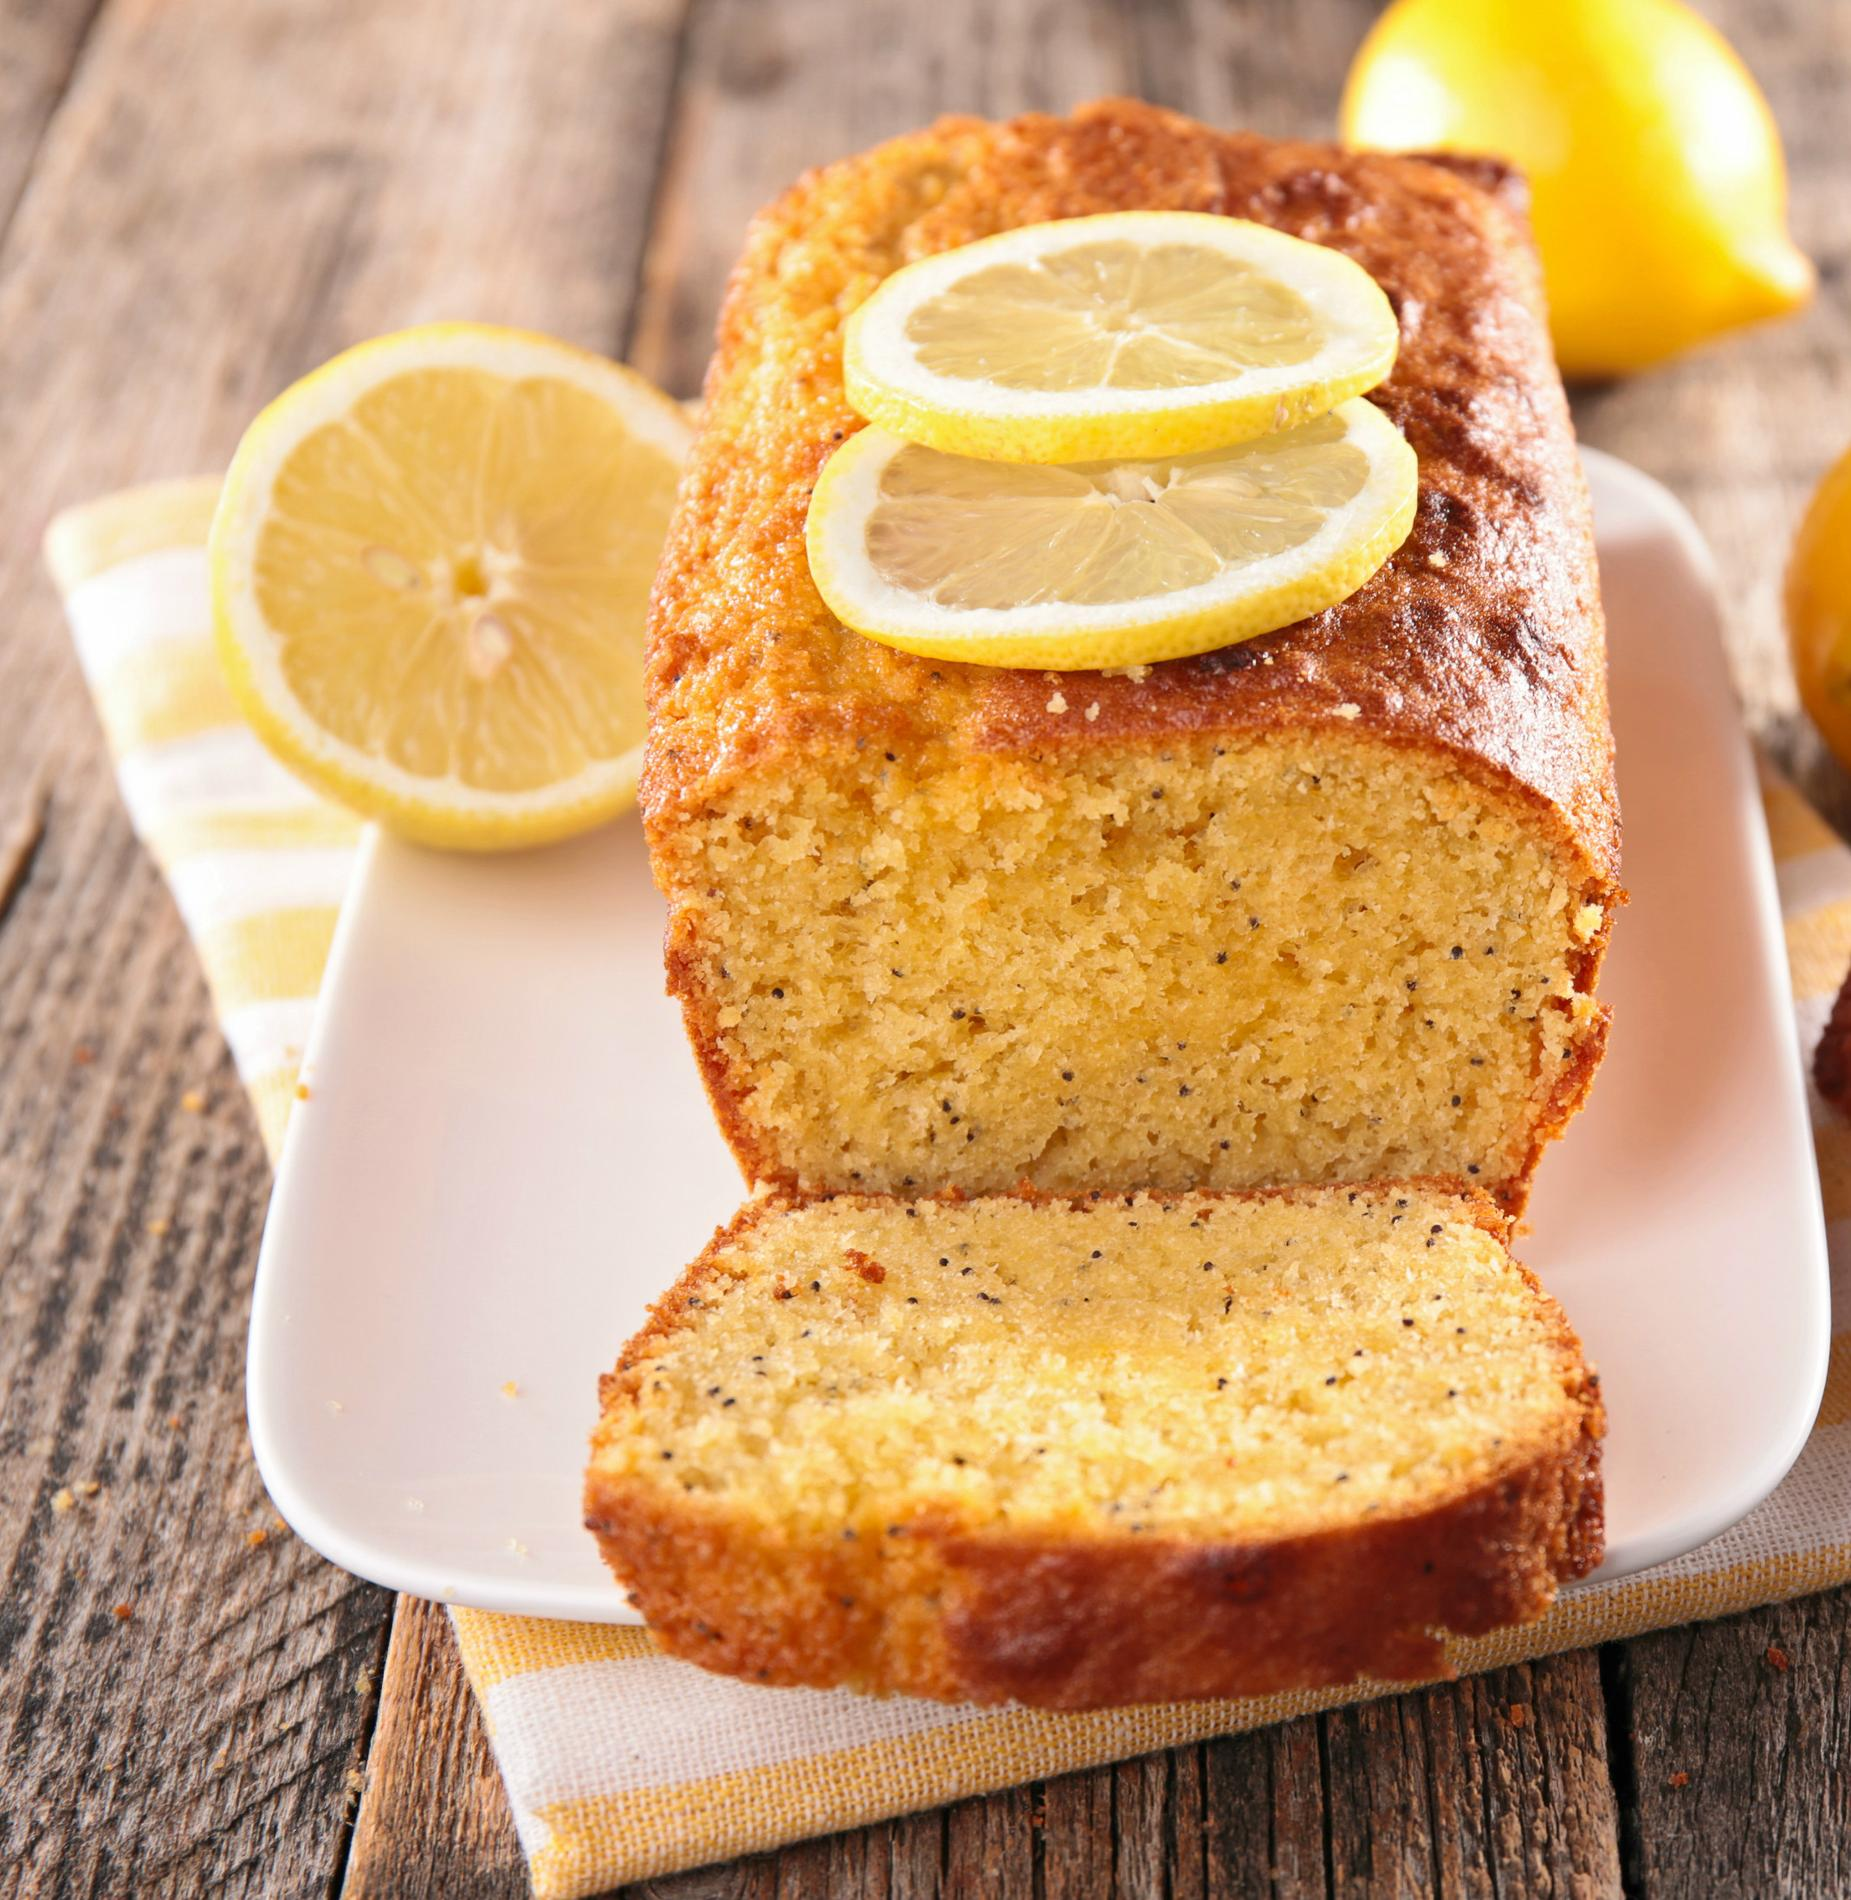 recette cake au citron cuisine madame figaro. Black Bedroom Furniture Sets. Home Design Ideas